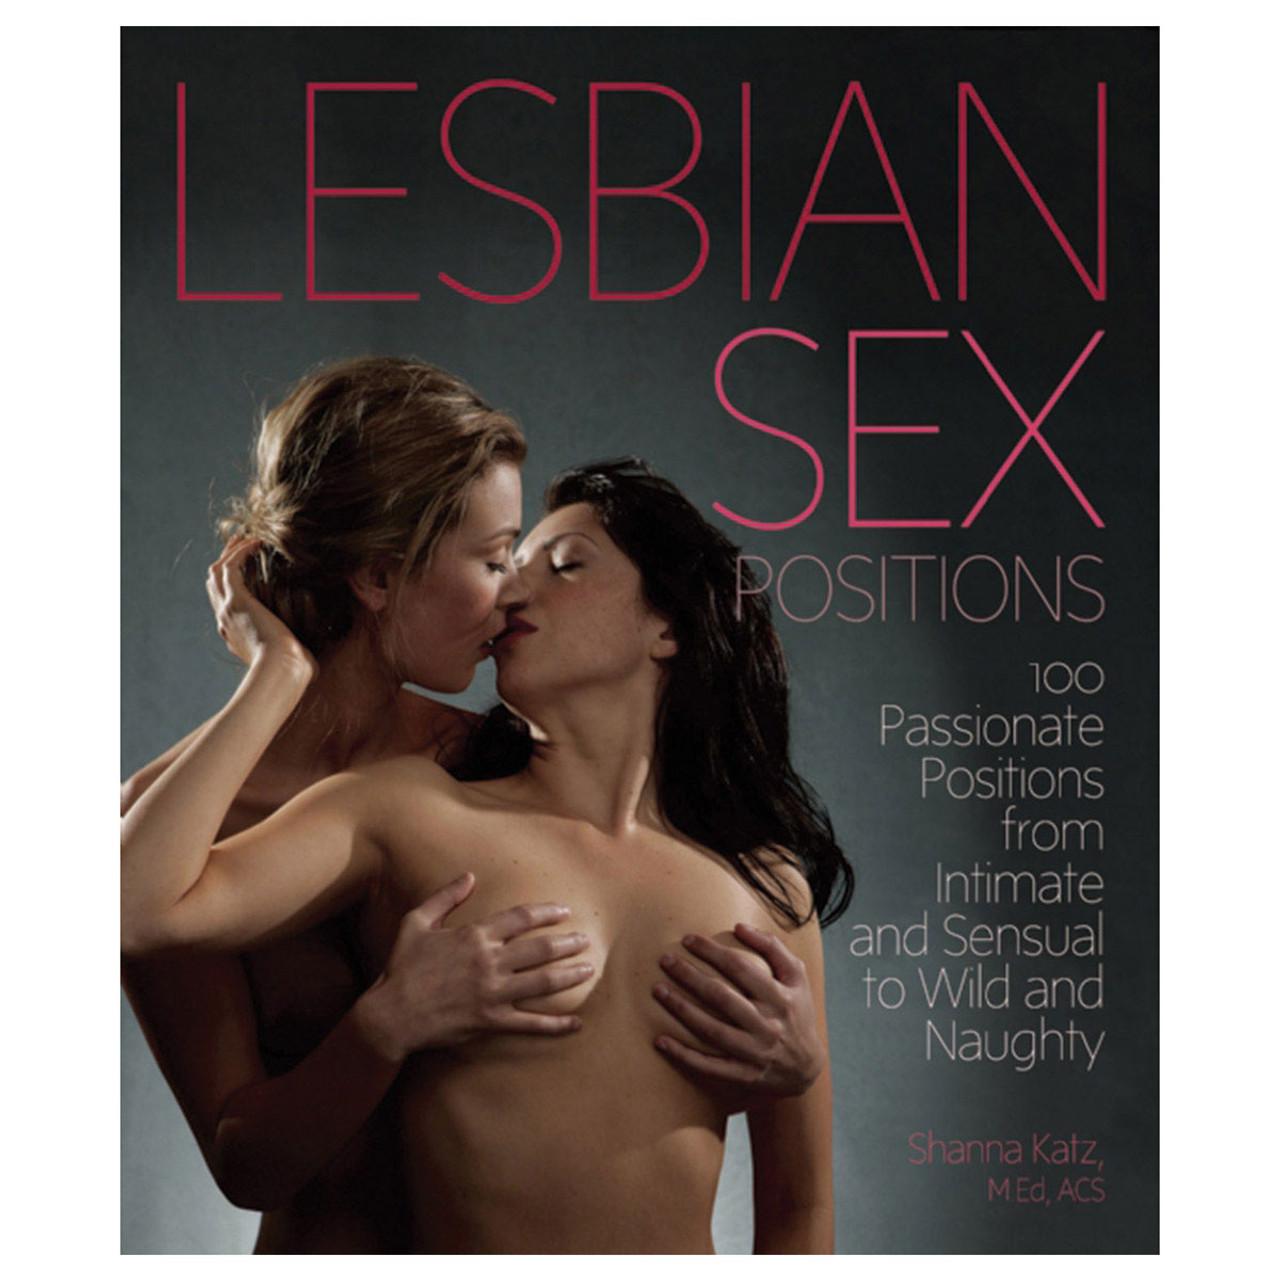 lesbisk sex positios veldig stramt fitte Sex Video